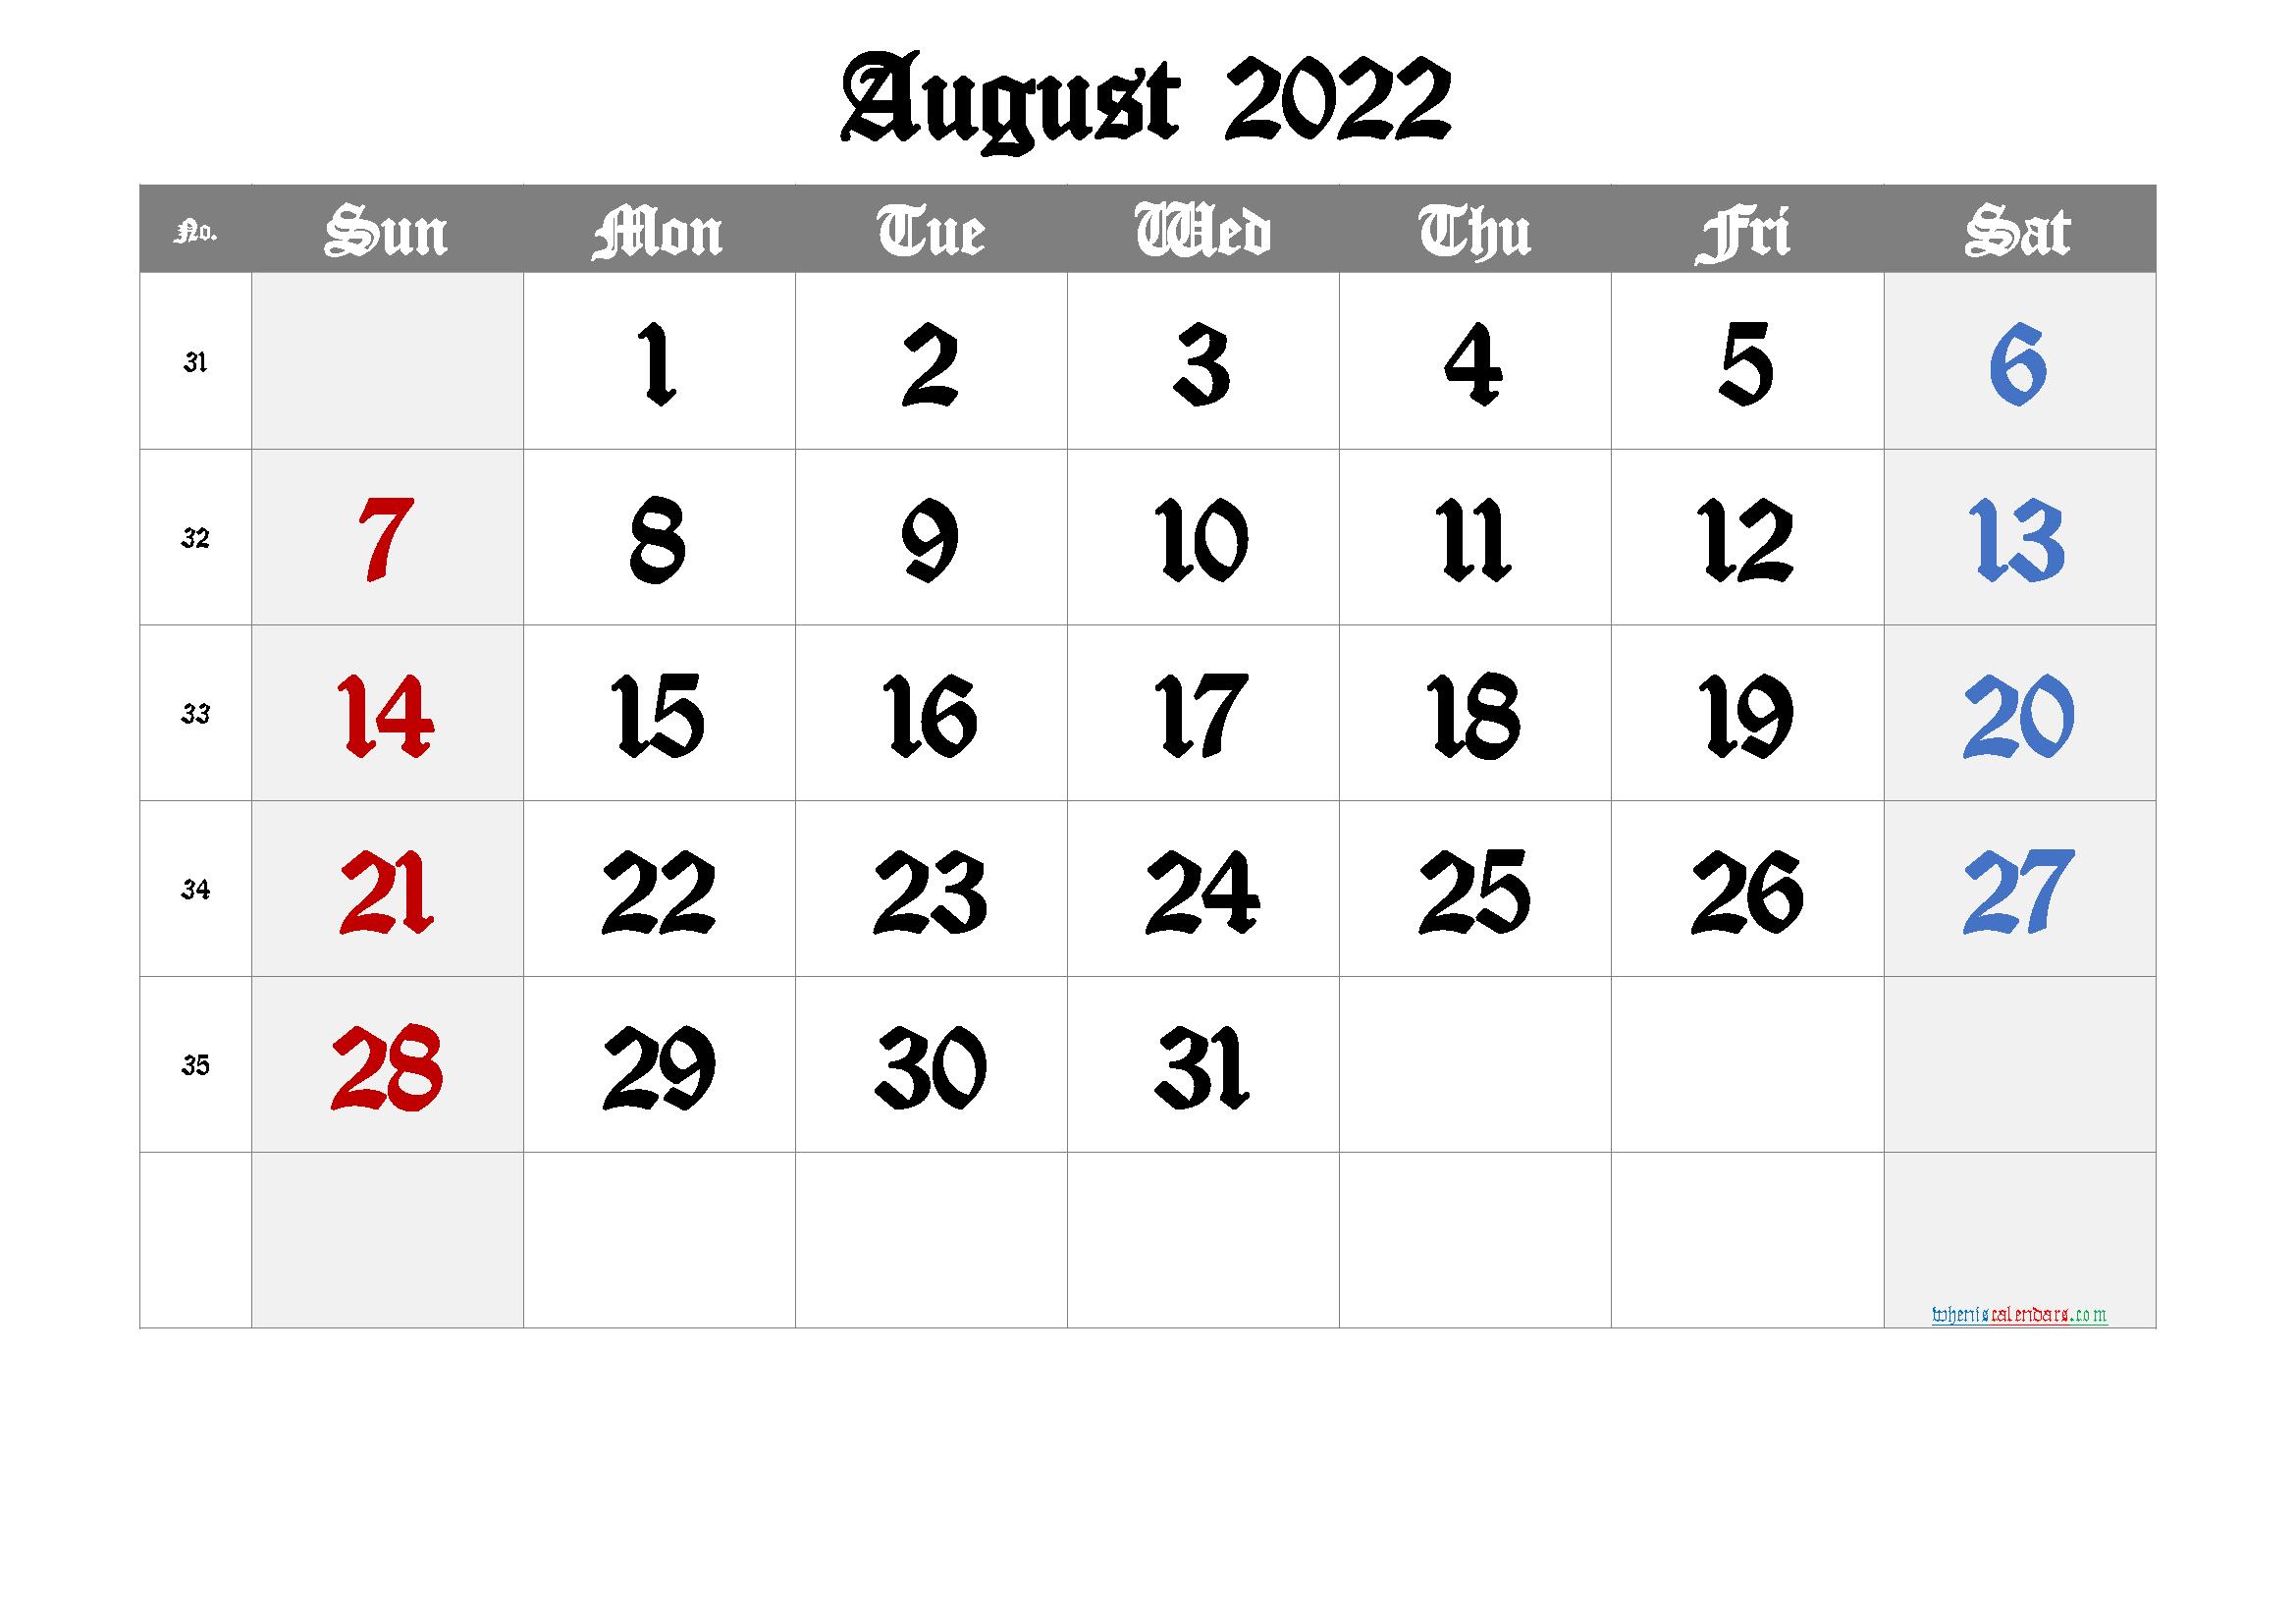 Printable Calendar 2022 August   Free Printable 2020 intended for Printable 2022 August Calendar Photo